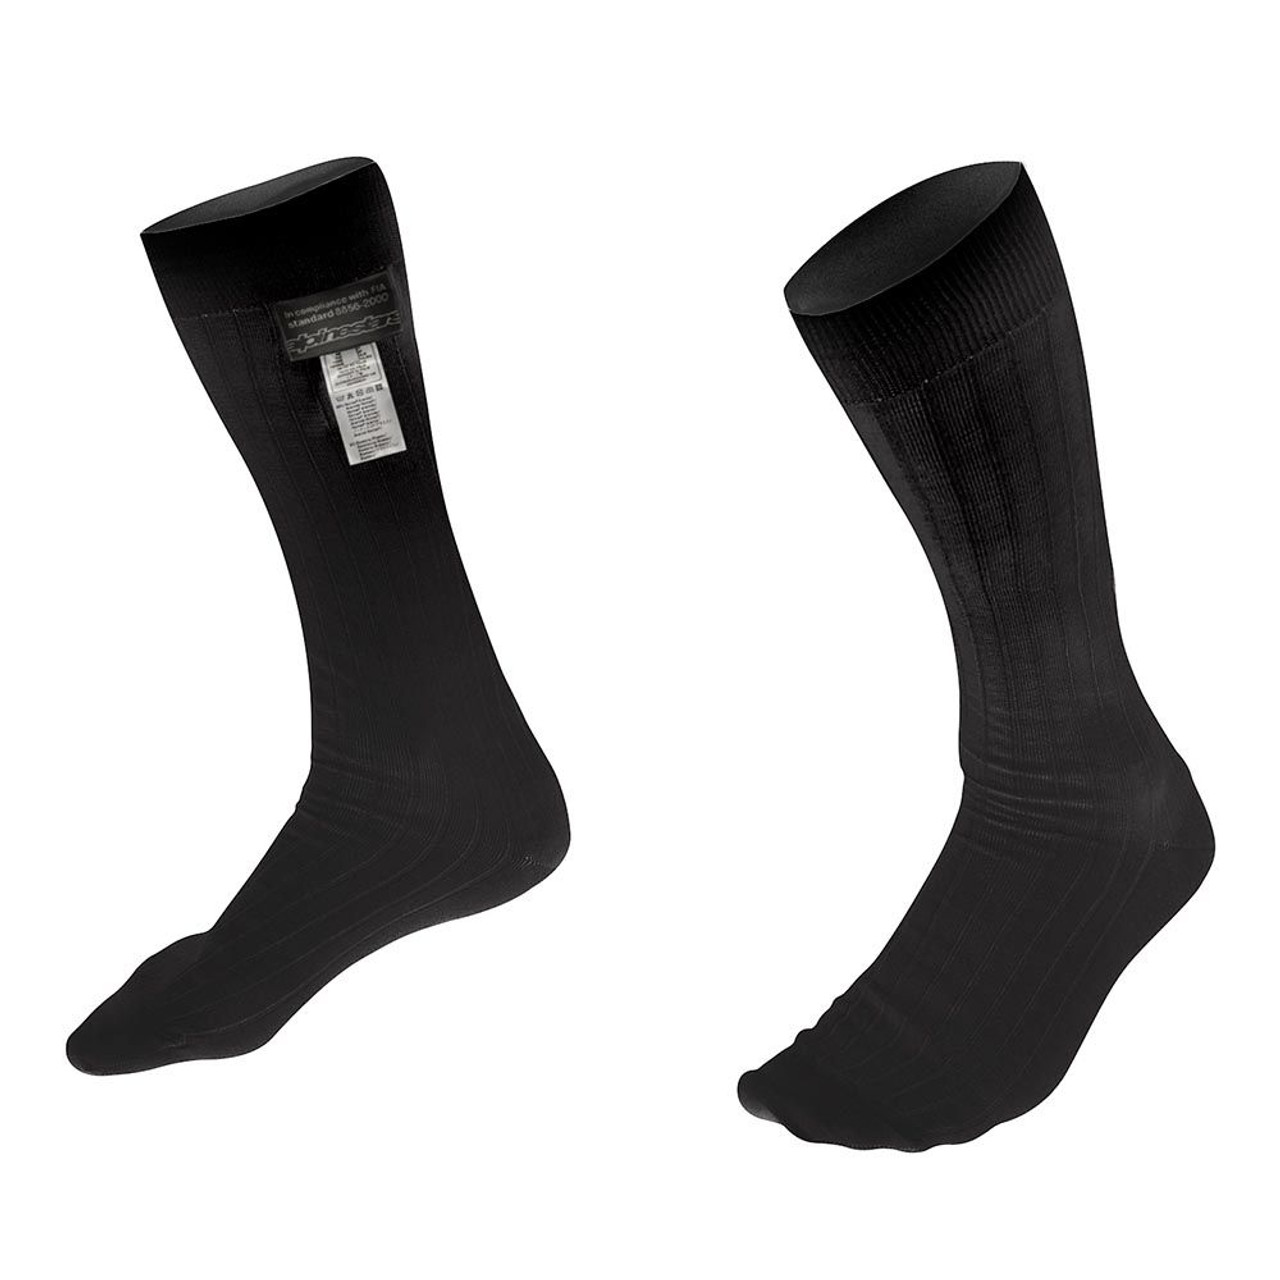 Alpinestars Nomex Socks - CLEARANCE